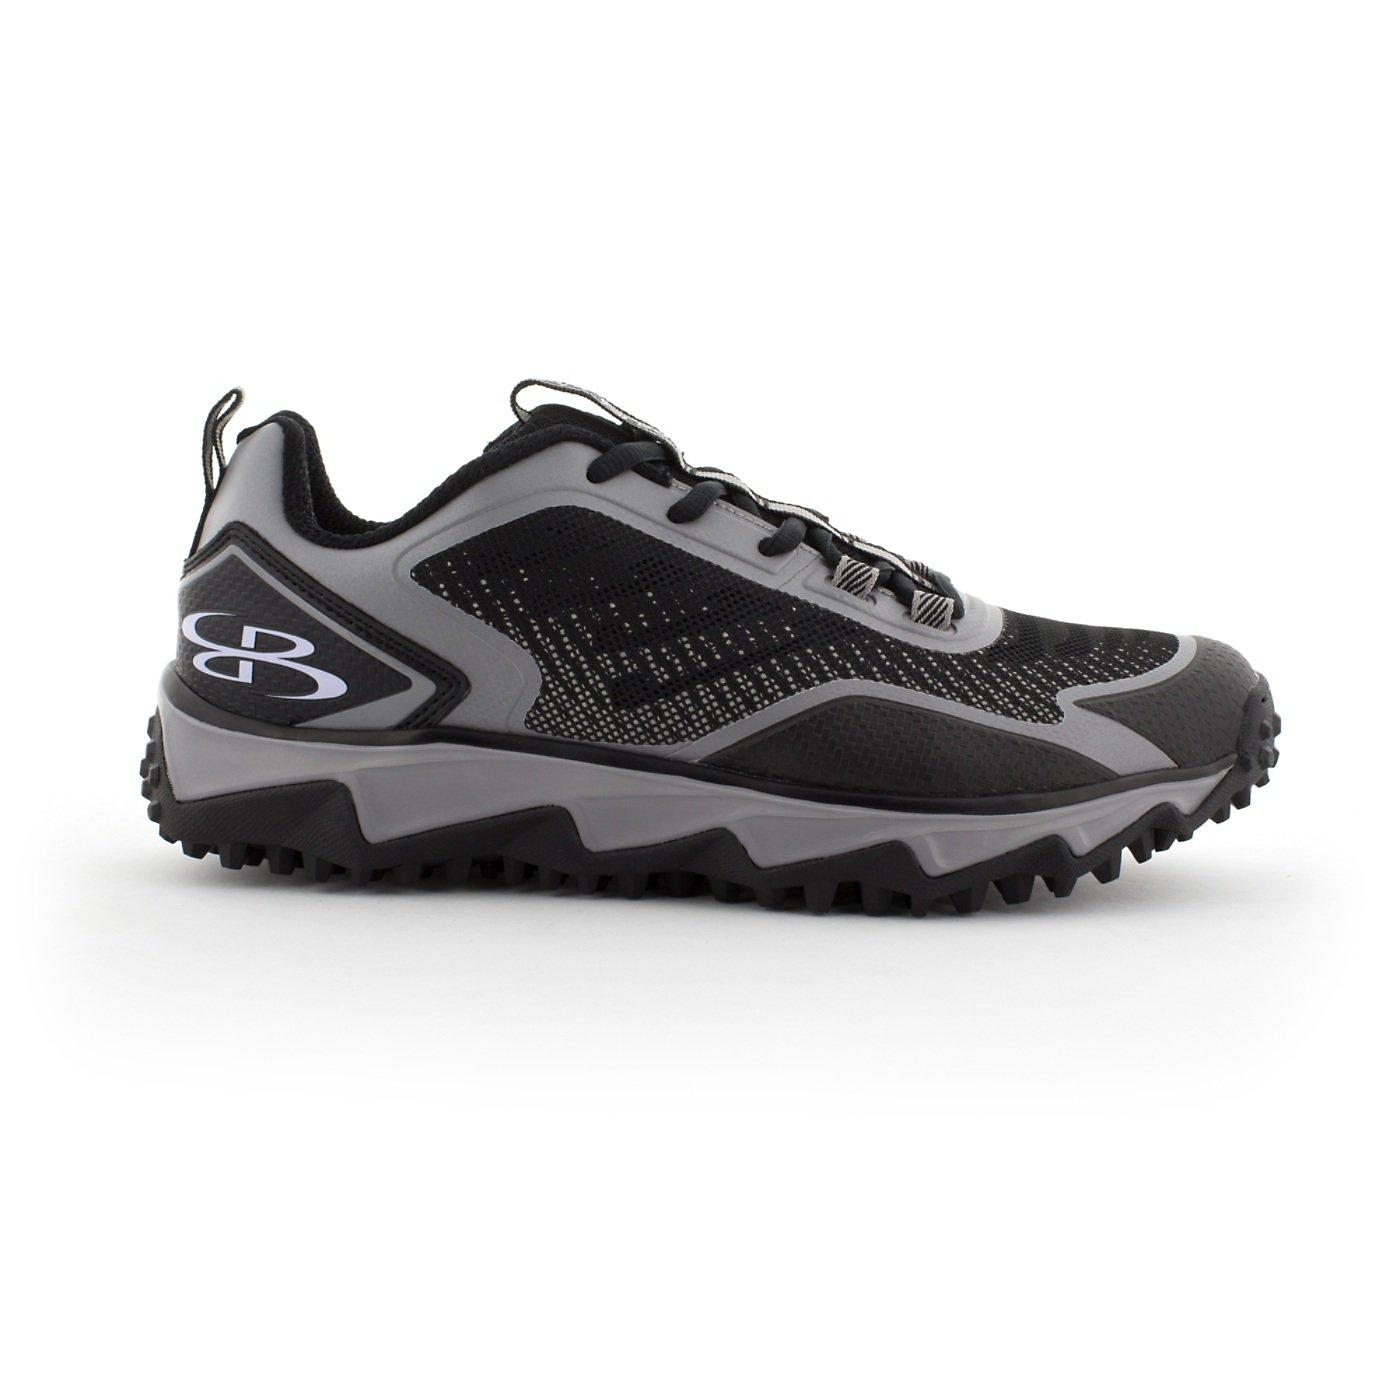 BoombahメンズBerzerk Turf Shoes – 13色オプション – 複数のサイズ B076B9X9MQ 6.5|ブラック/グレー ブラック/グレー 6.5